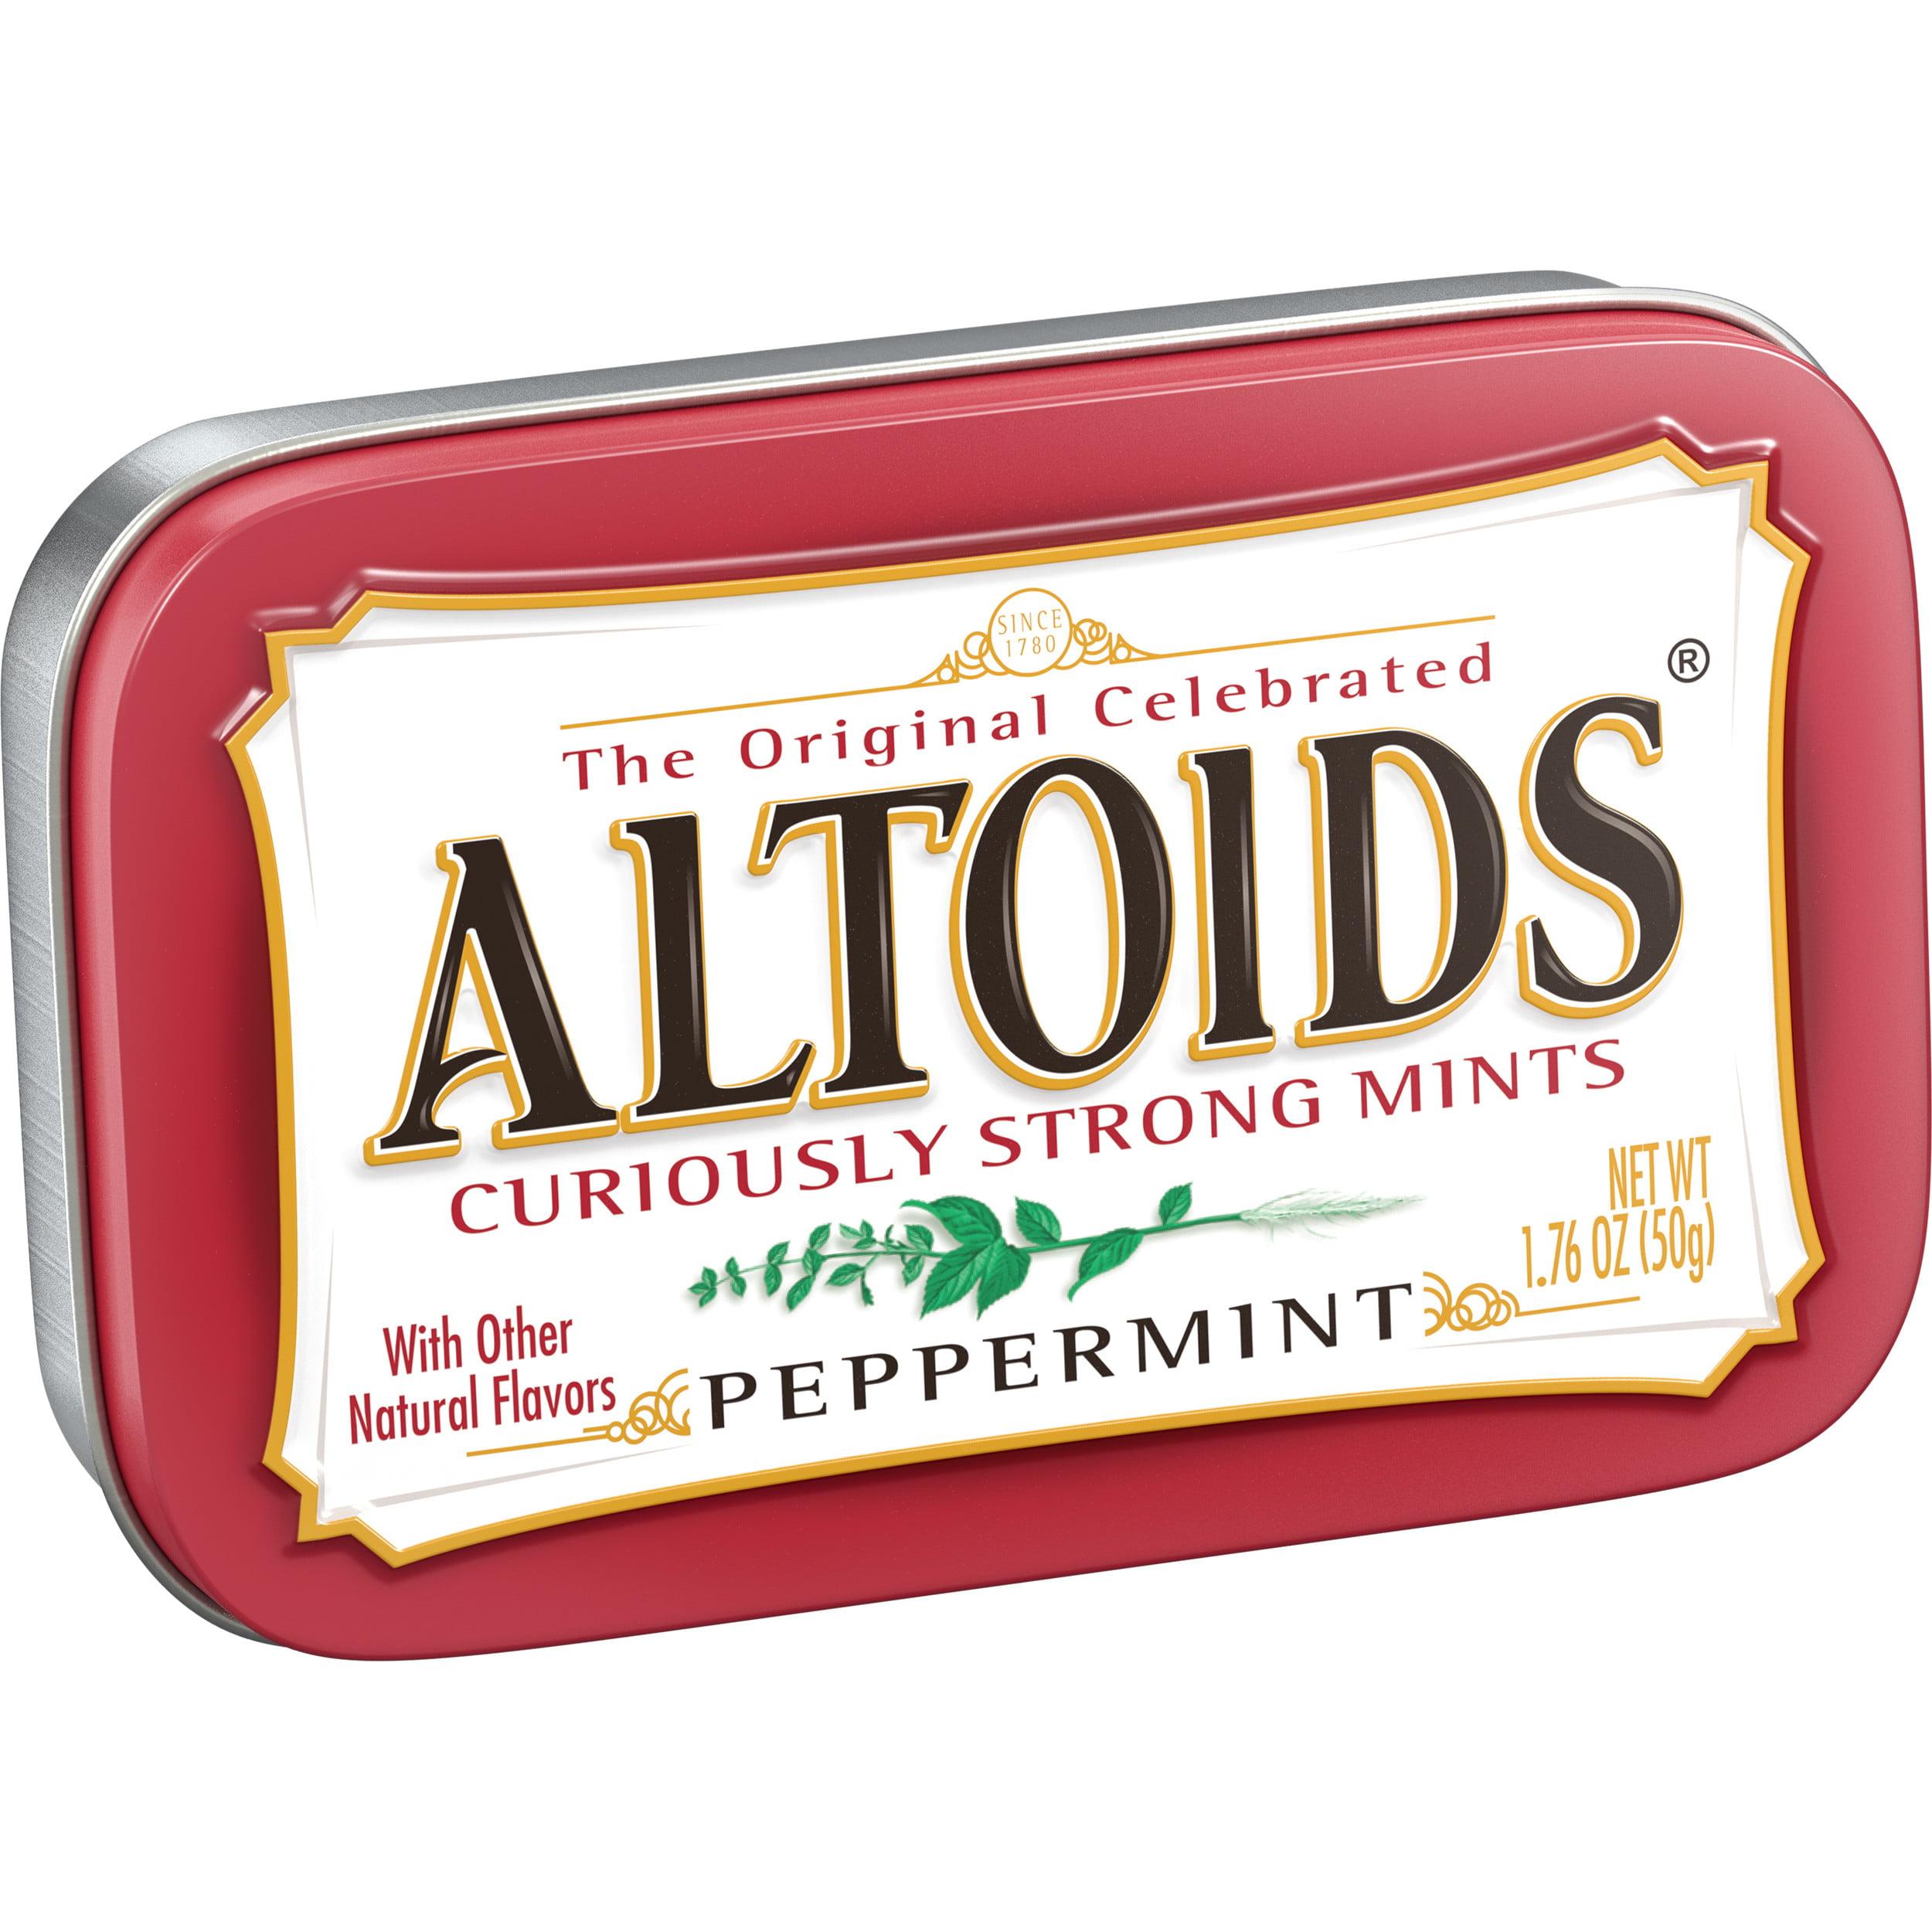 Altoids Peppermint Mints Single Pack, 1.76 ounce by Wrigley